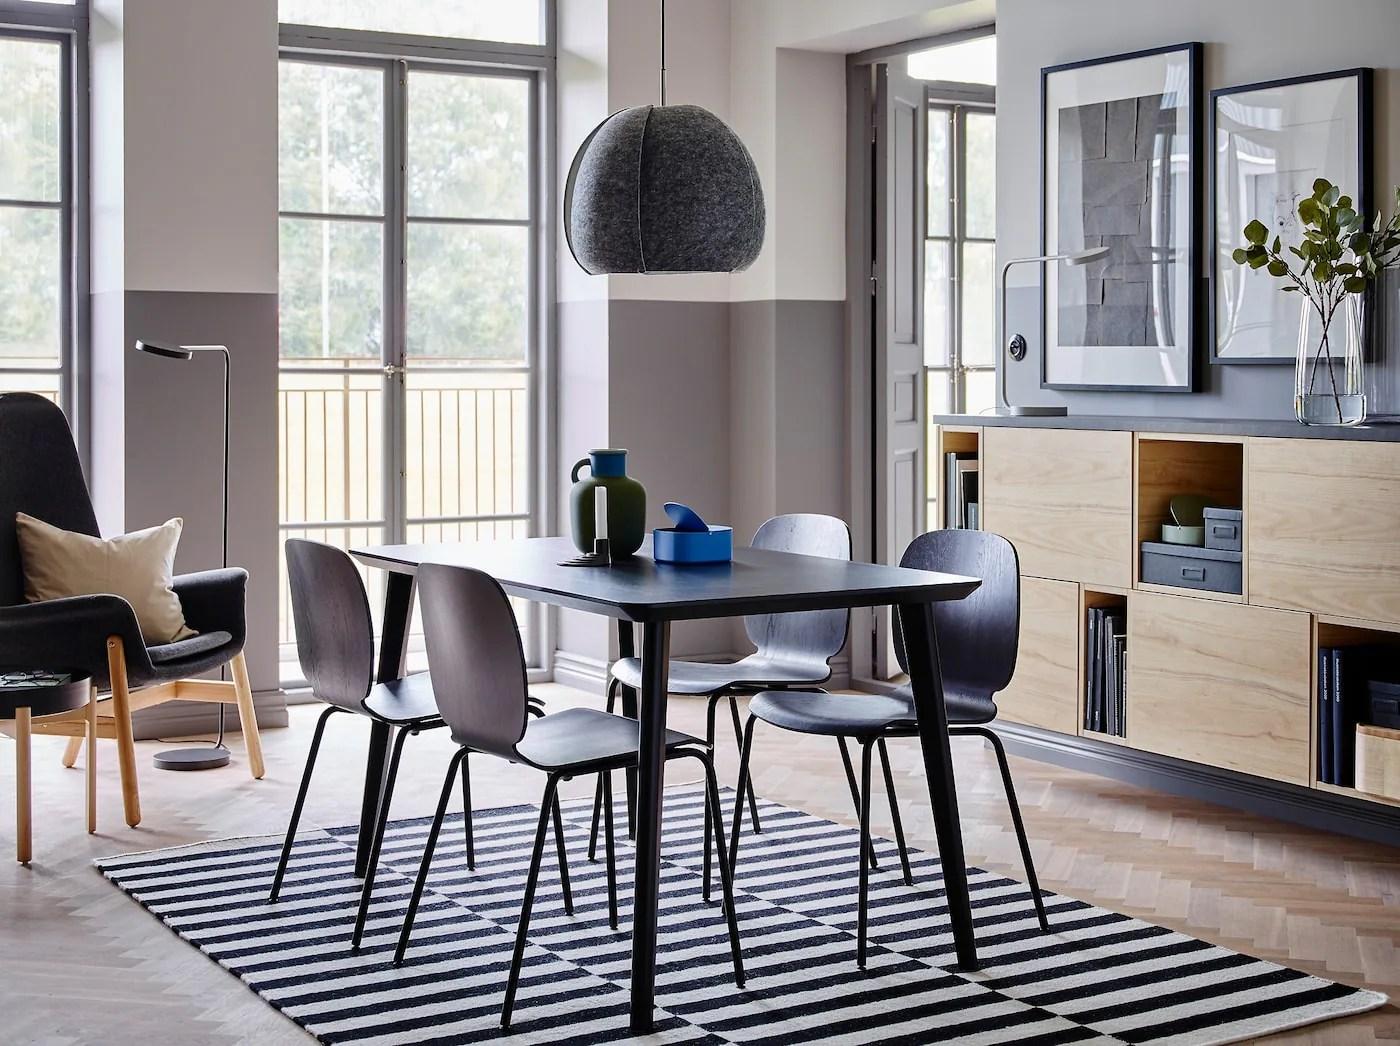 Dining Room Design Ideas Gallery Ikea